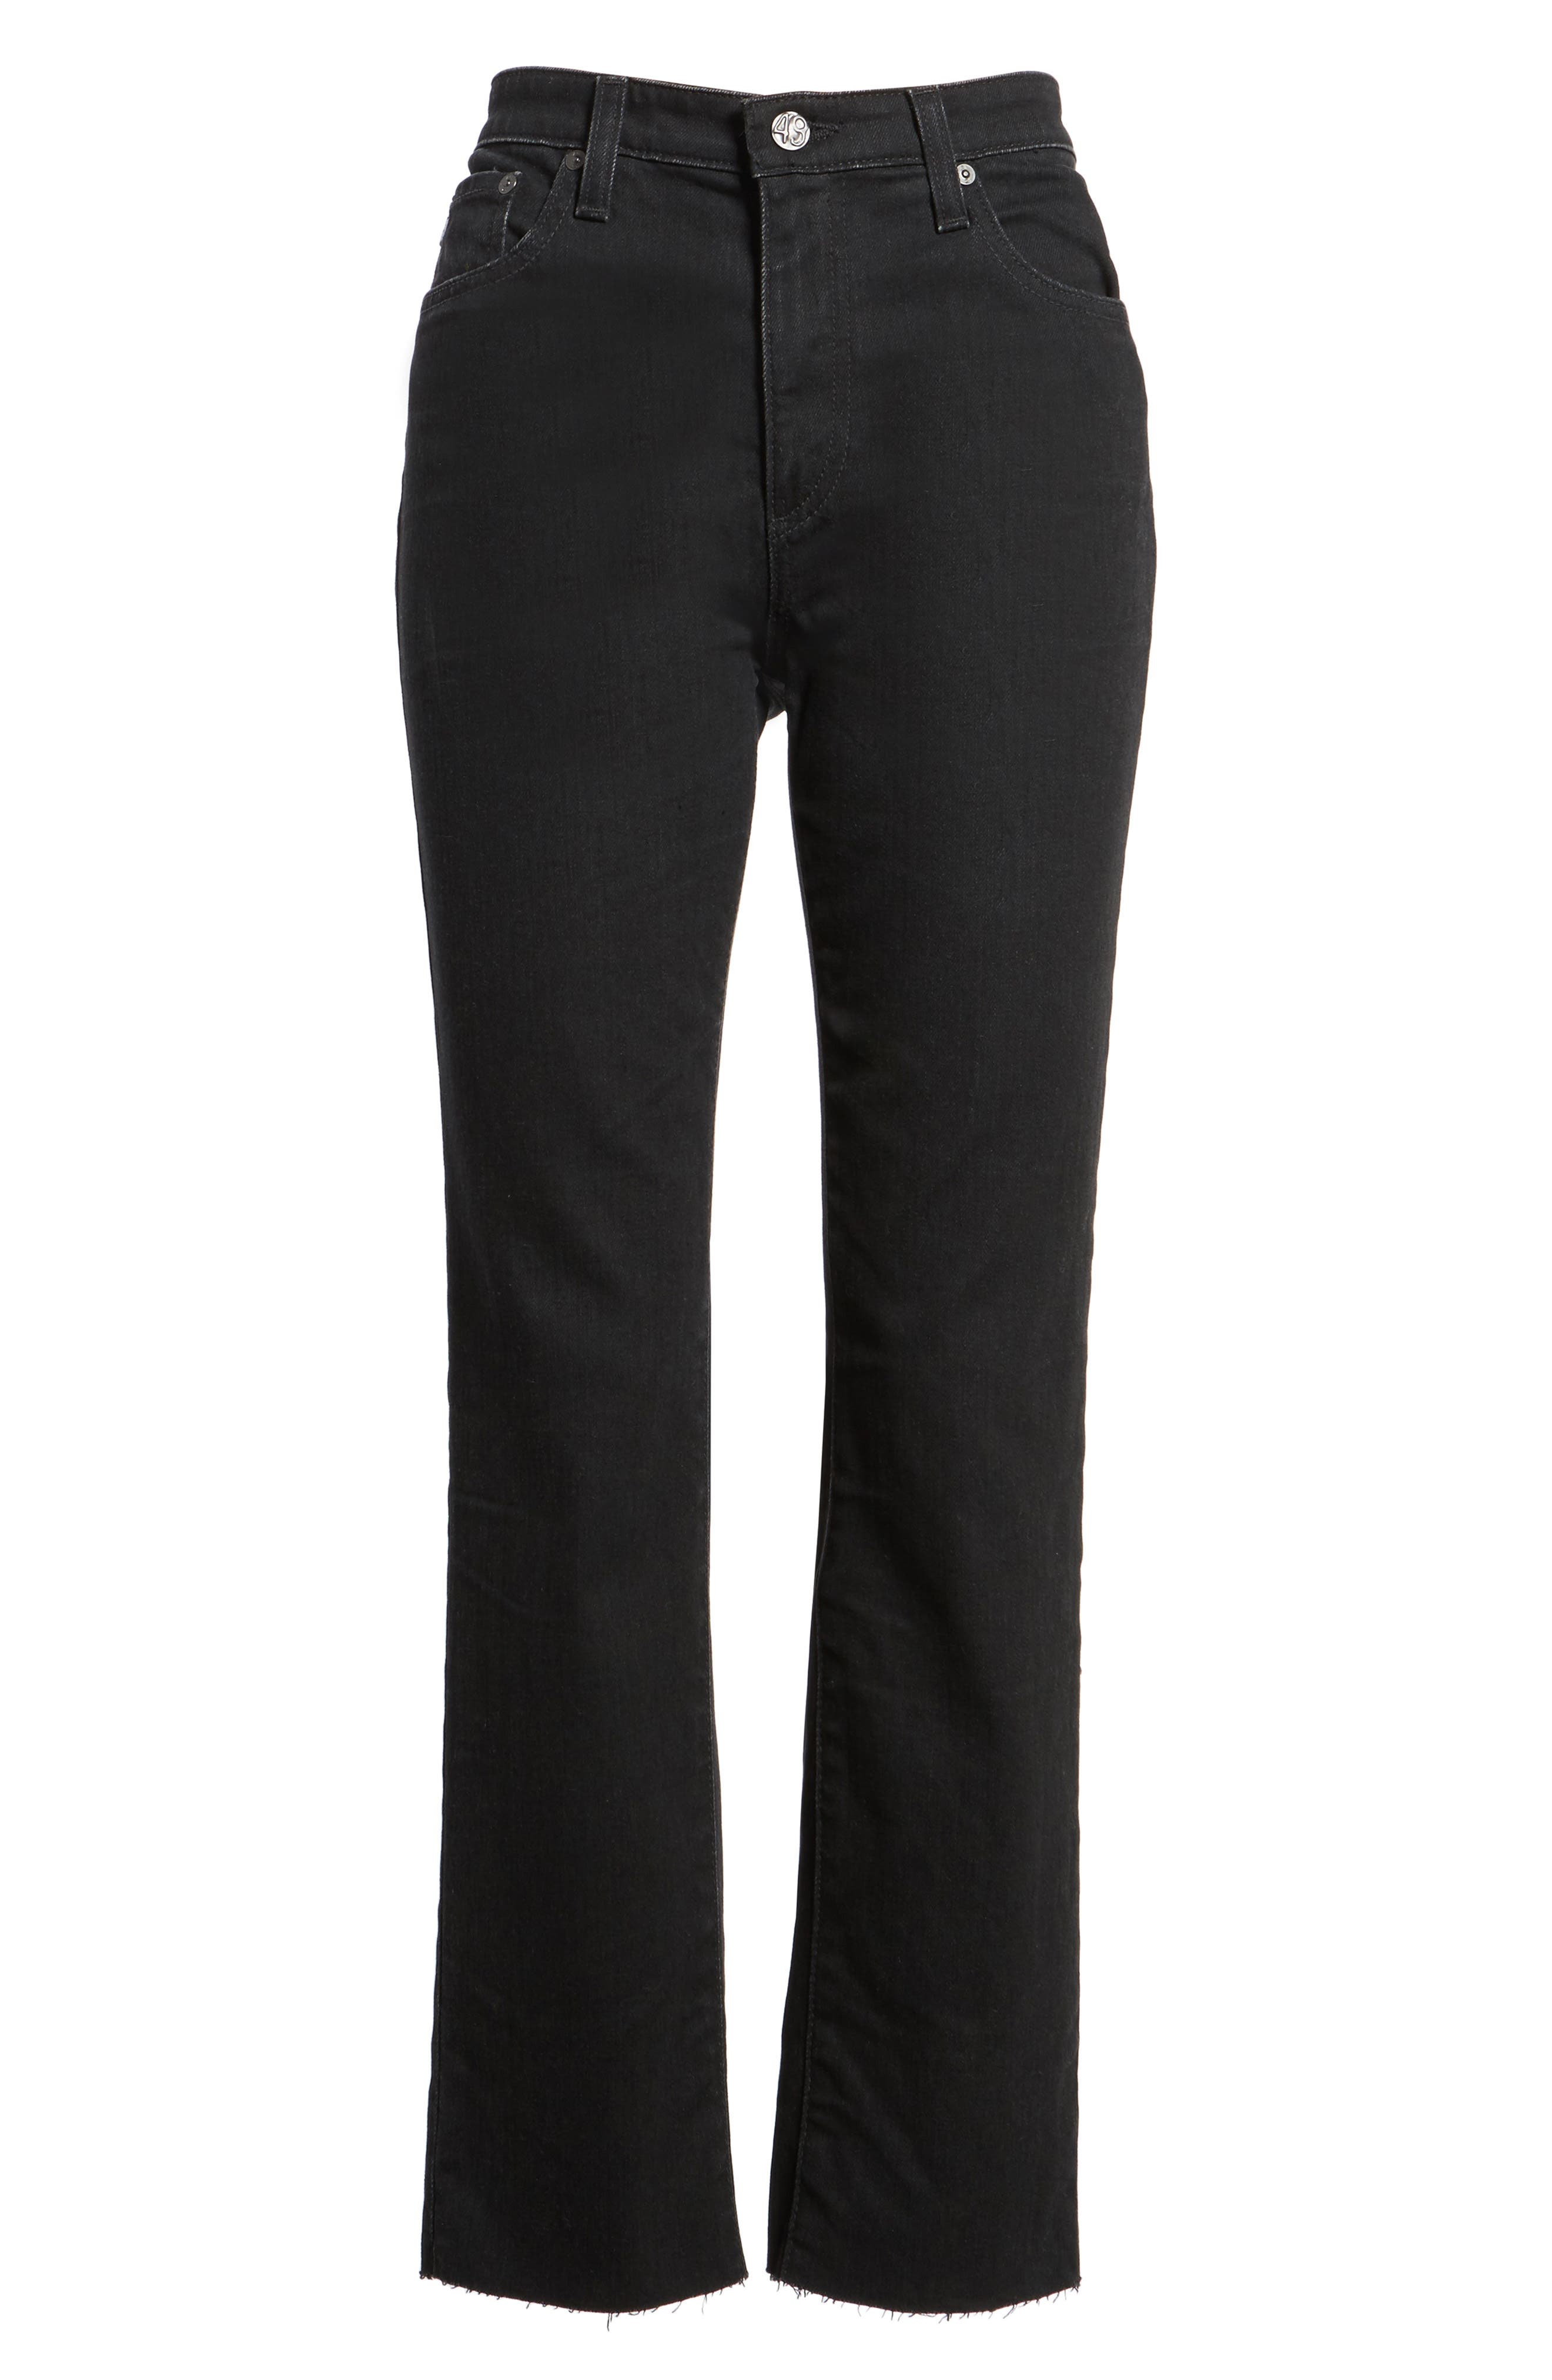 The Isabelle High Waist Crop Straight Leg Jeans,                             Alternate thumbnail 7, color,                             1 Year Black Hawk